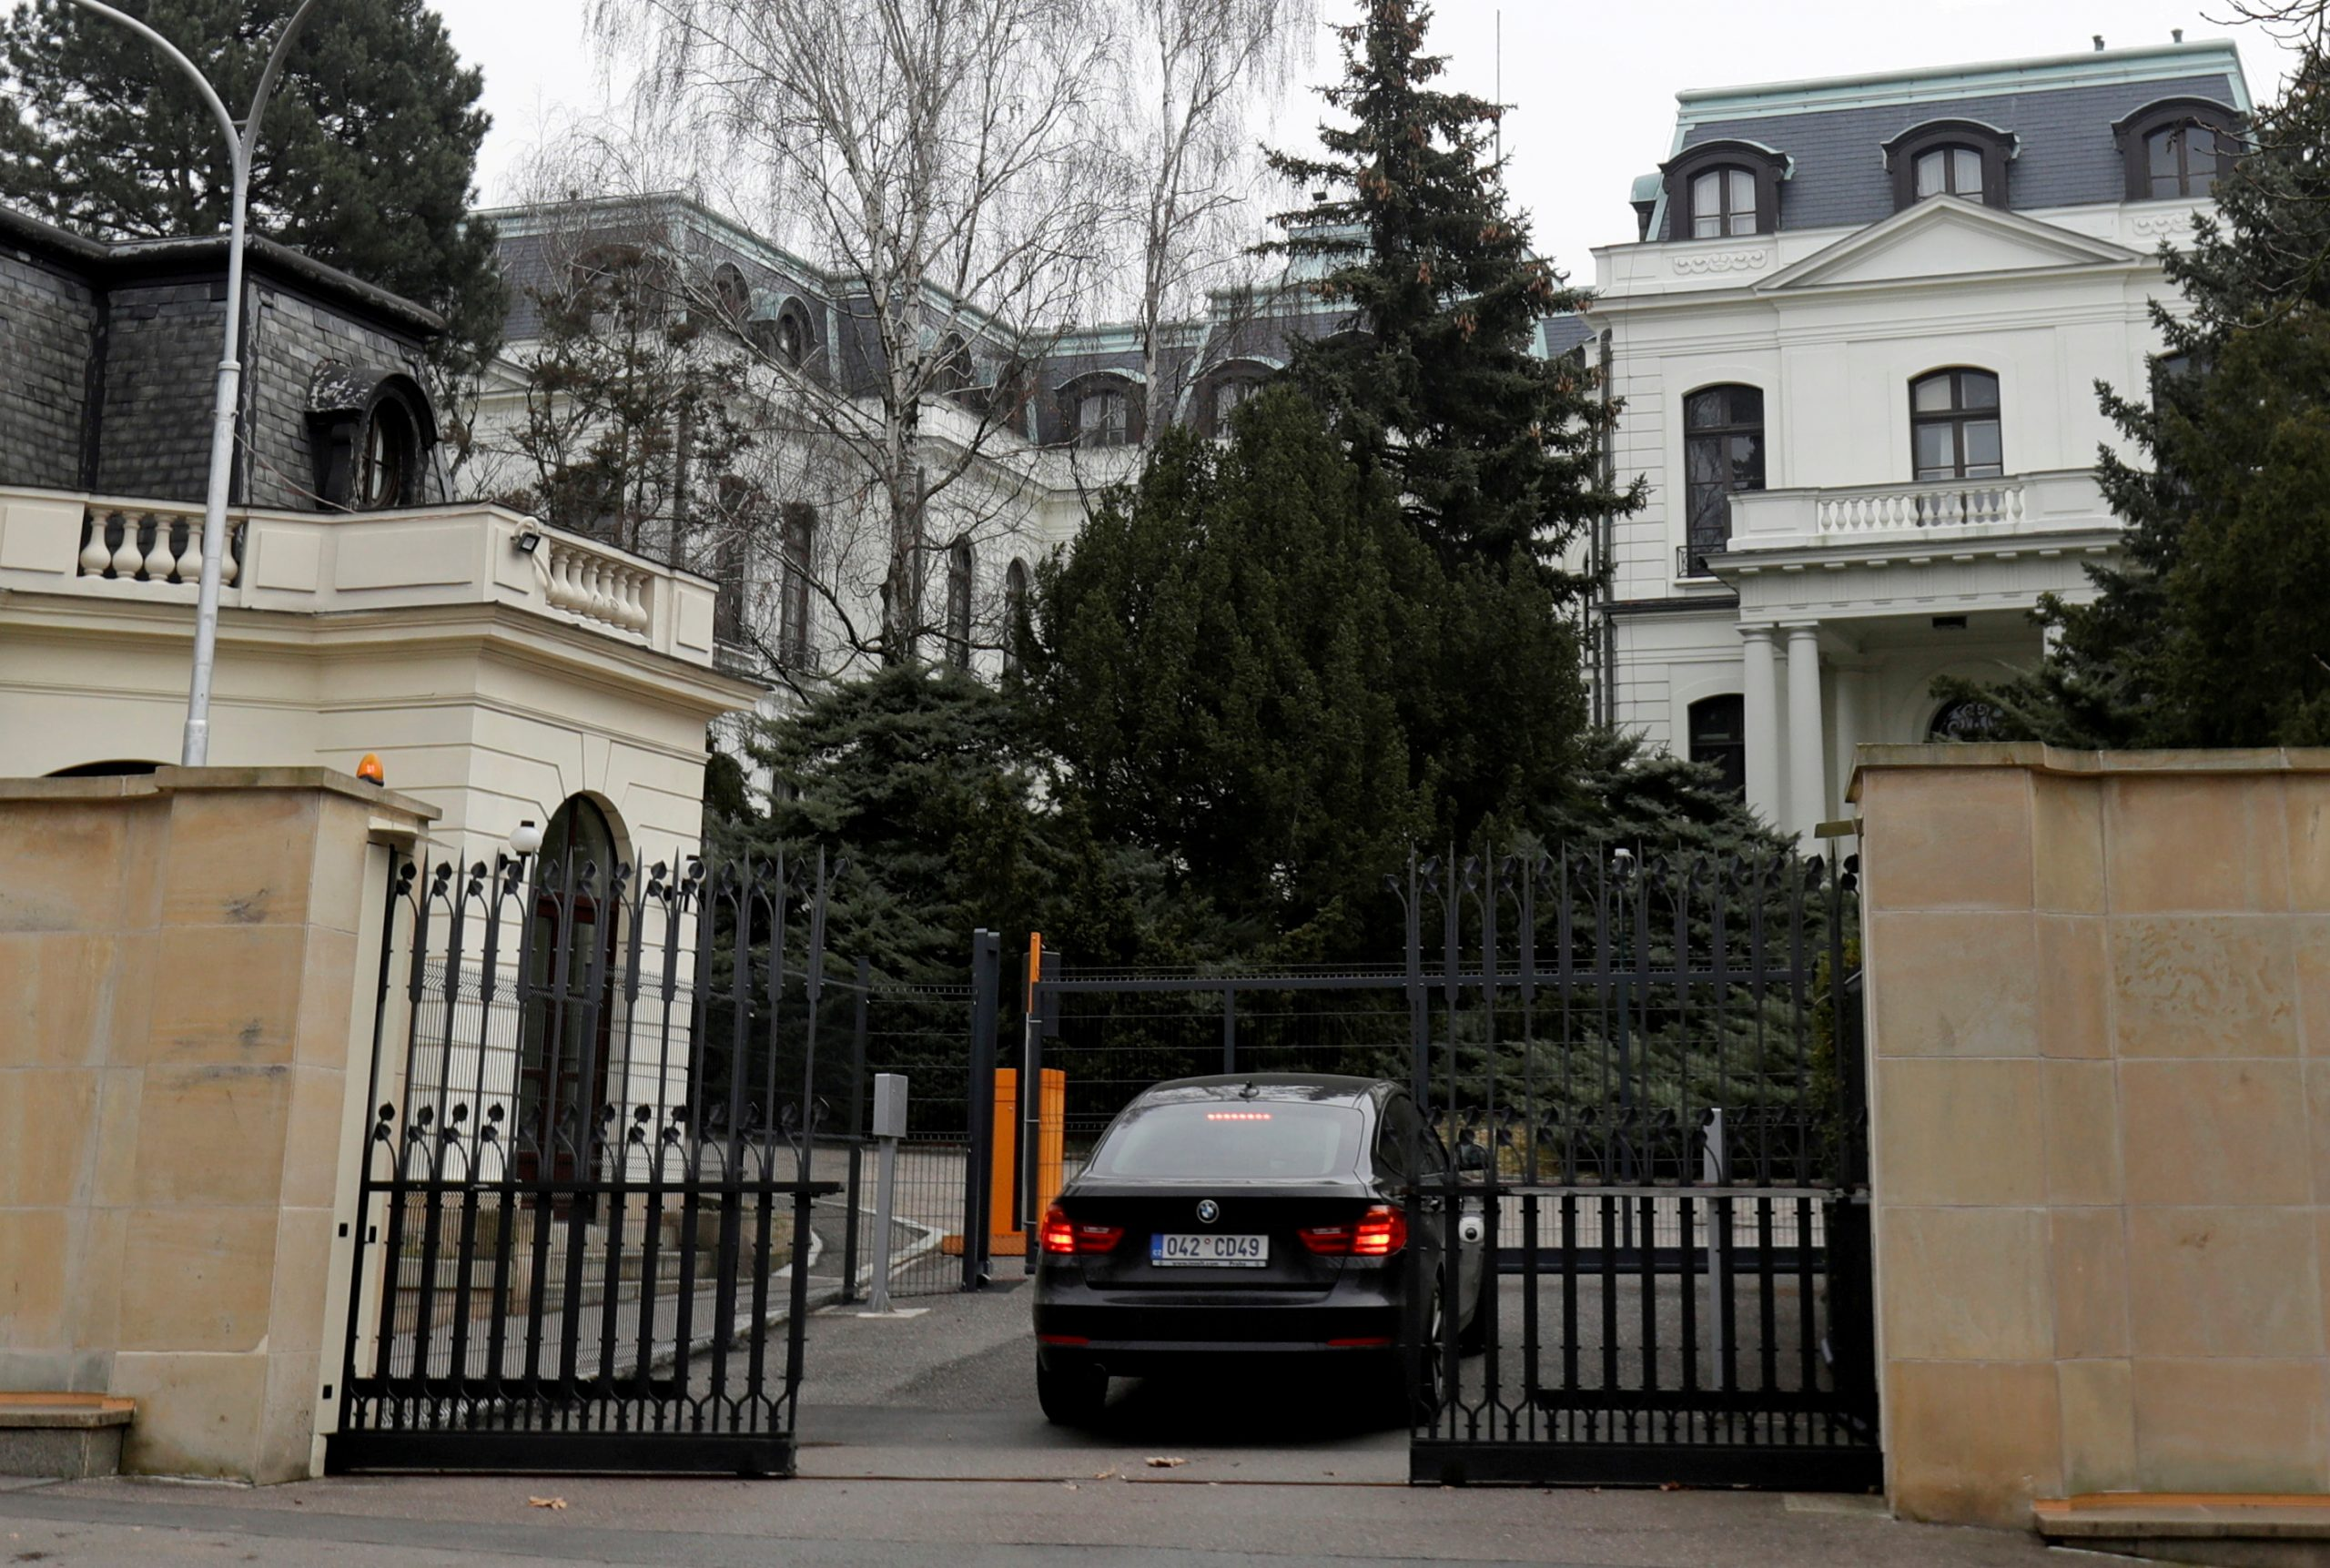 Rusko veleposlanstvo u Pragu, foto: REUTERS/David W Cerny